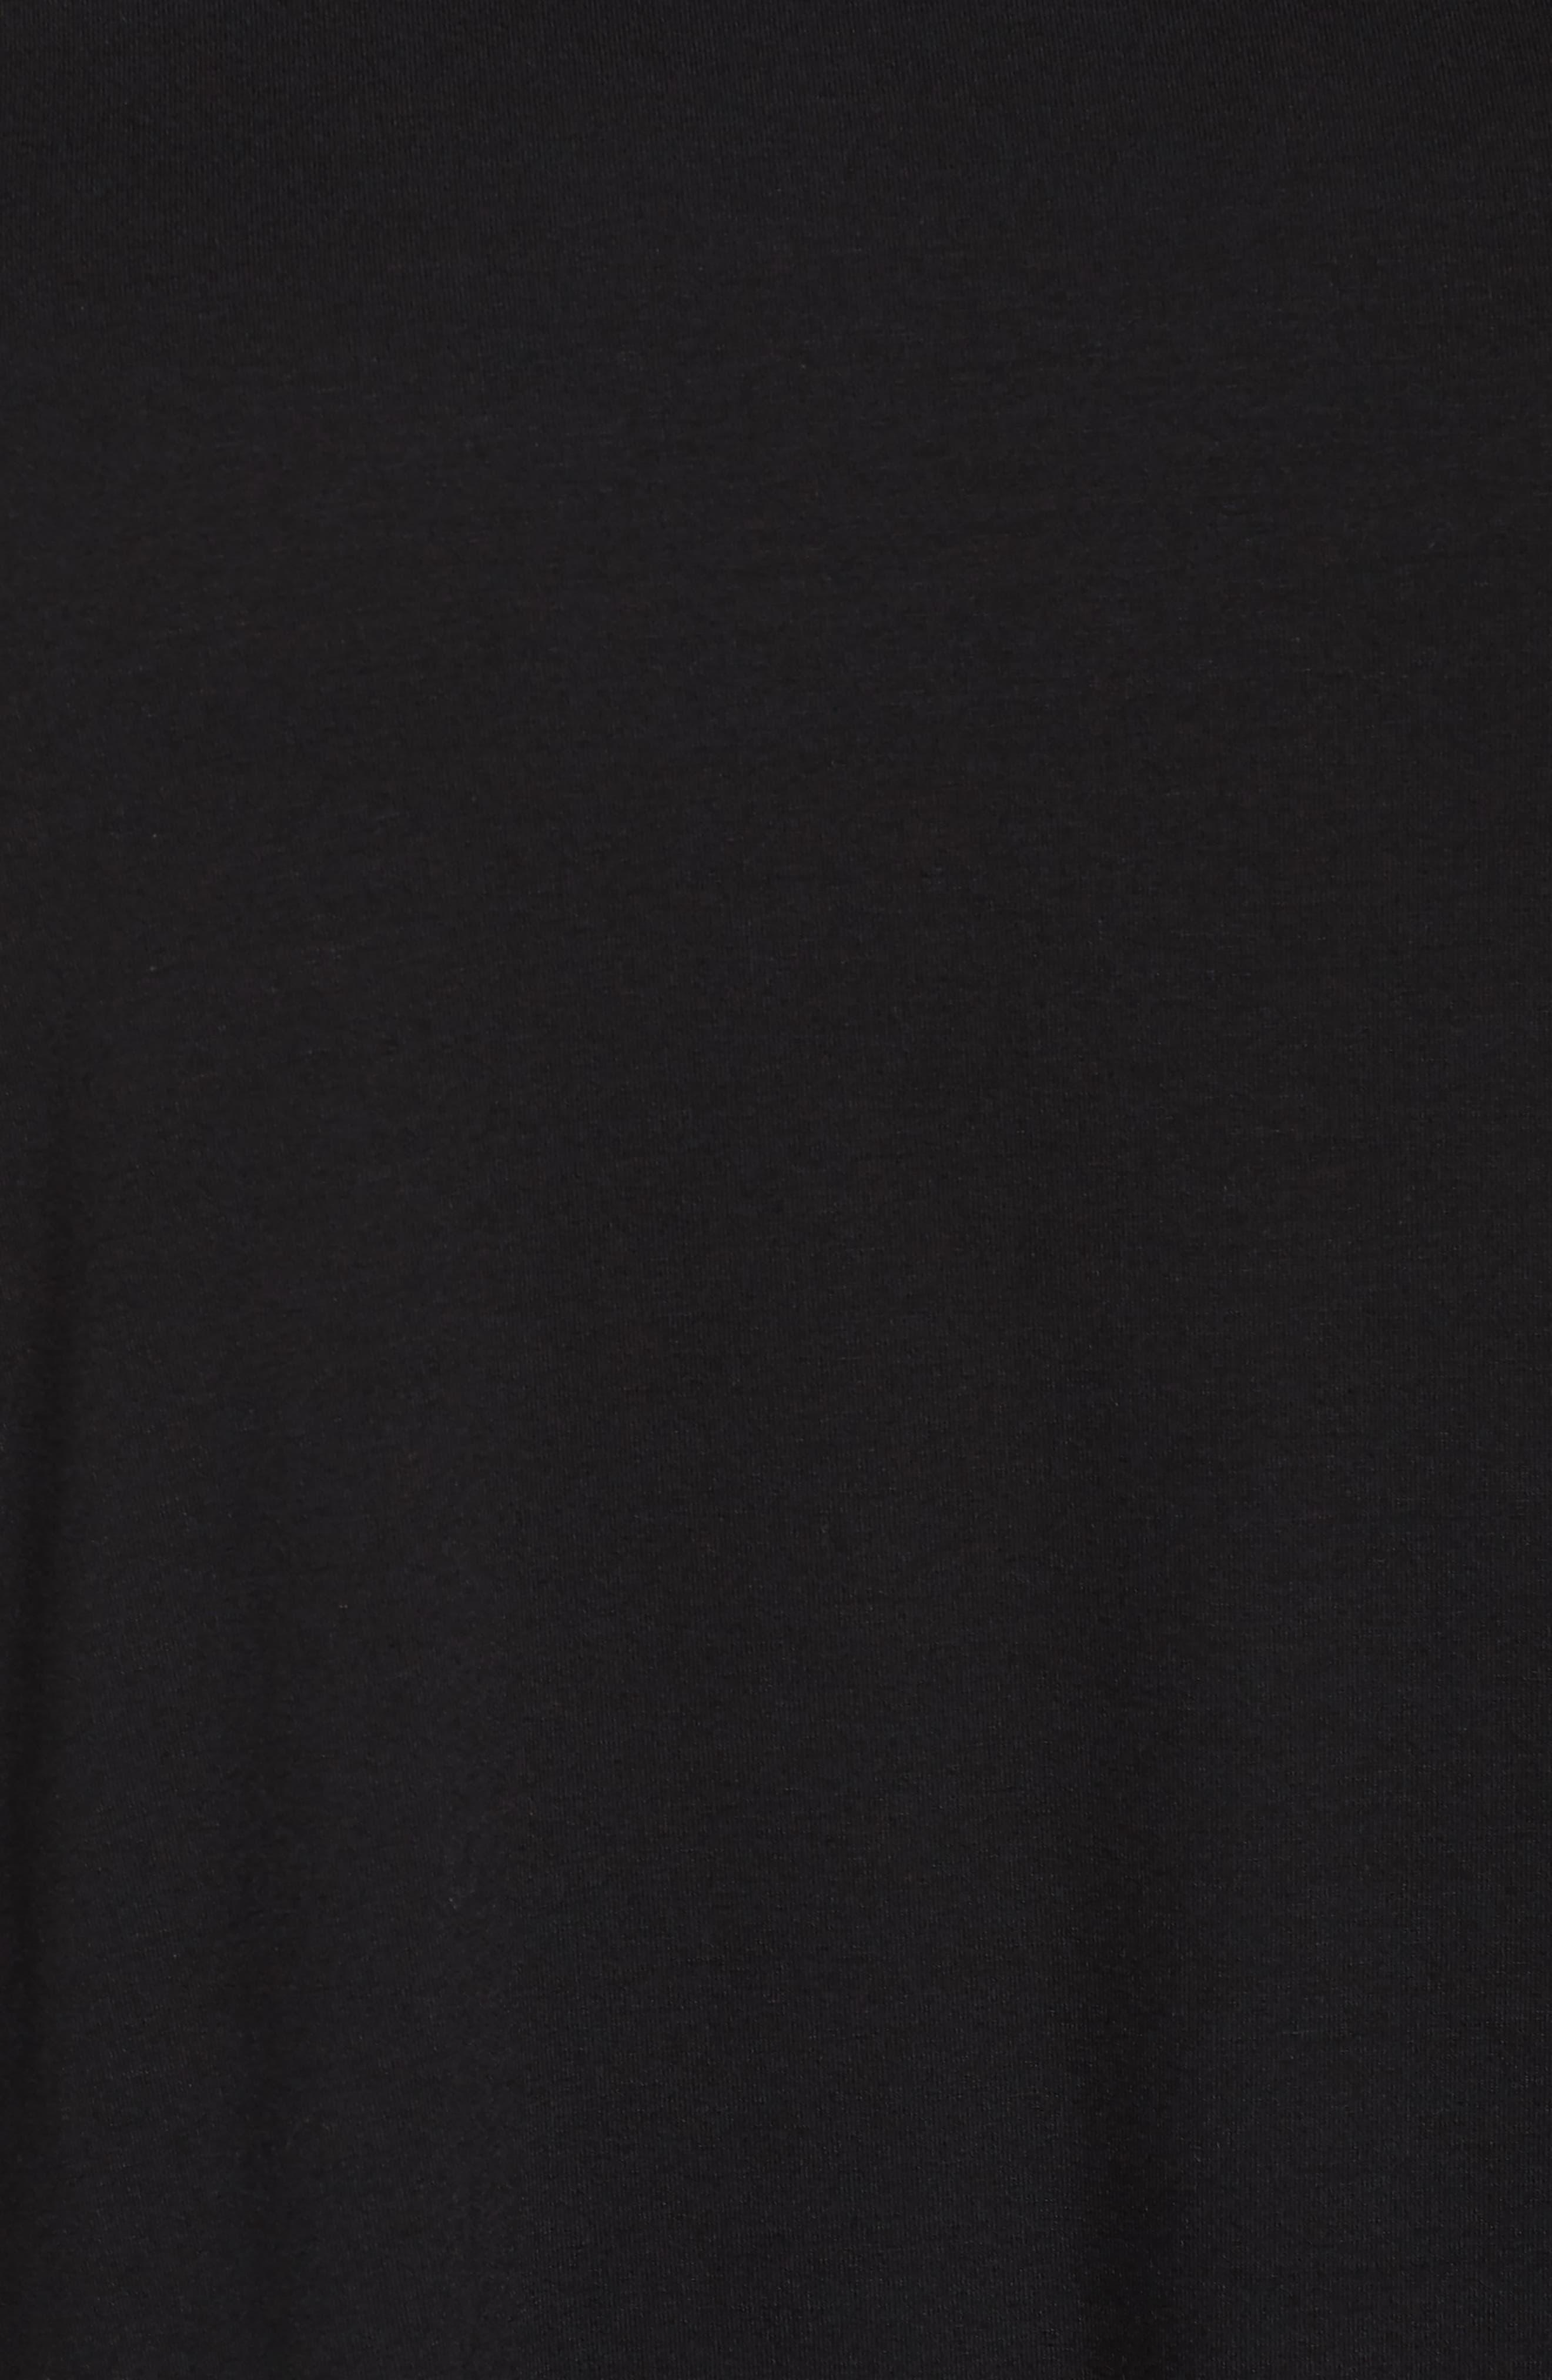 Jersey Shift Dress,                             Alternate thumbnail 5, color,                             001